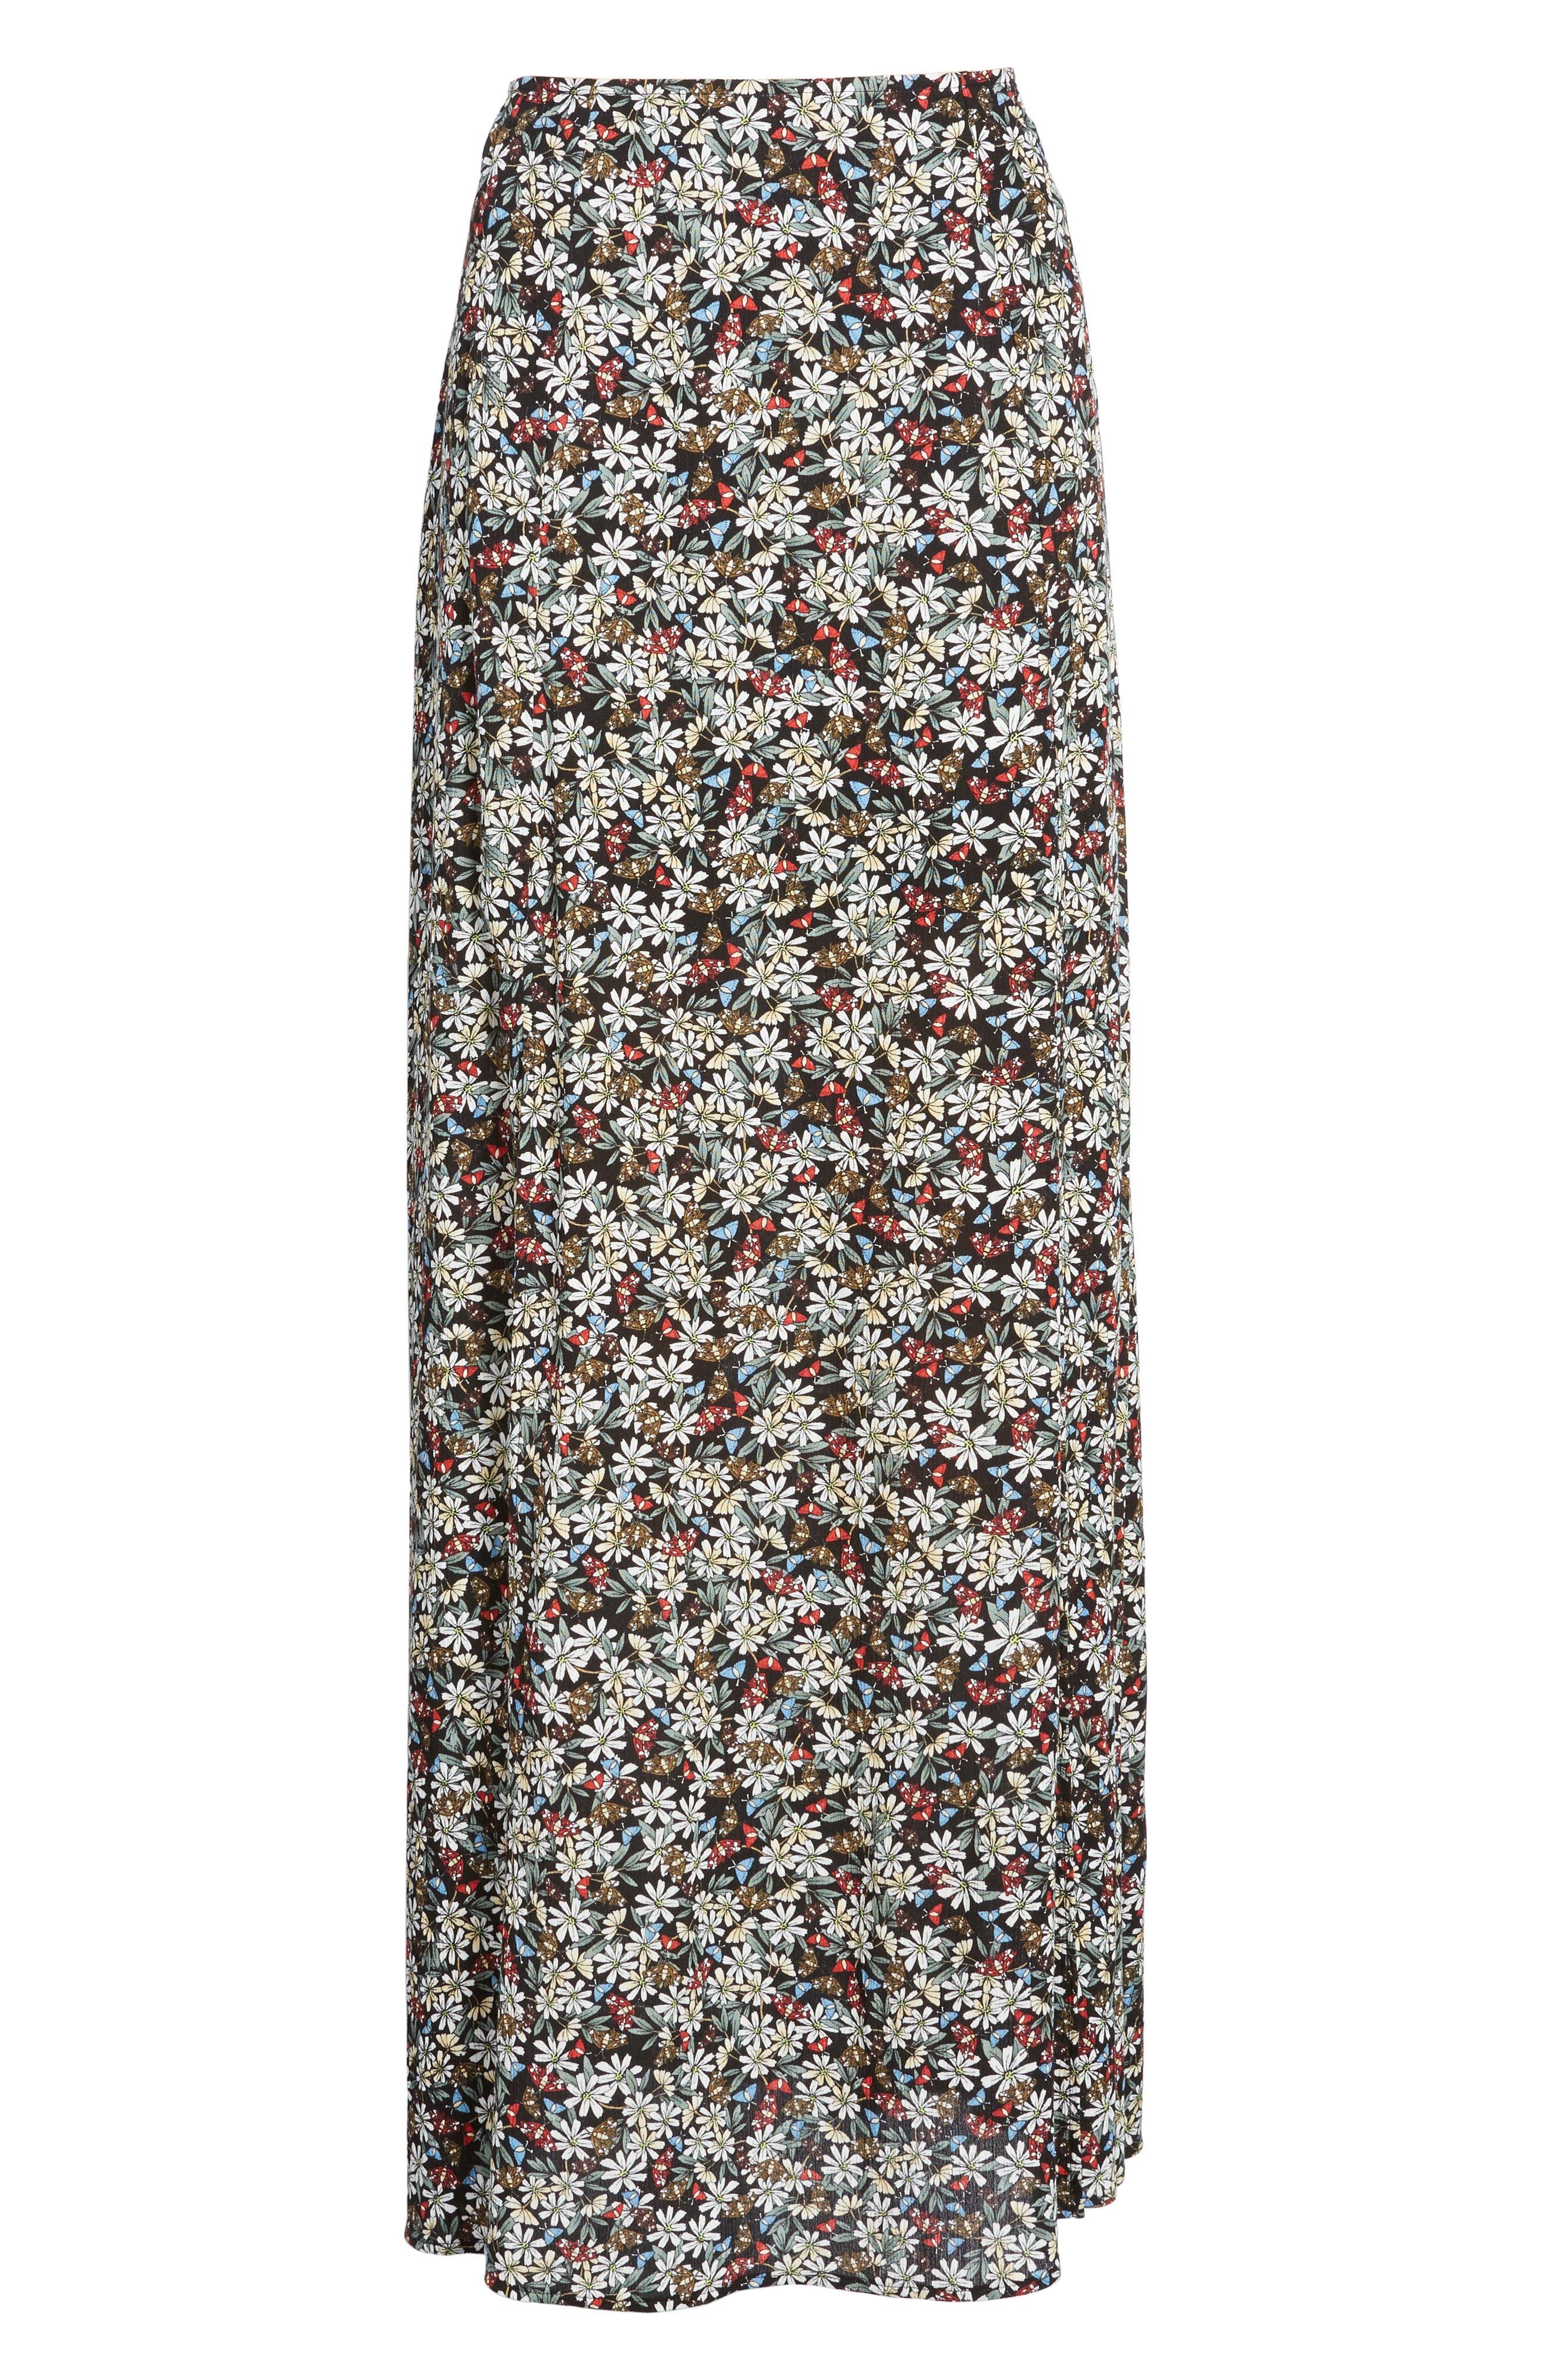 Flora Slit Front Maxi Skirt,                             Alternate thumbnail 7, color,                             Multi Black